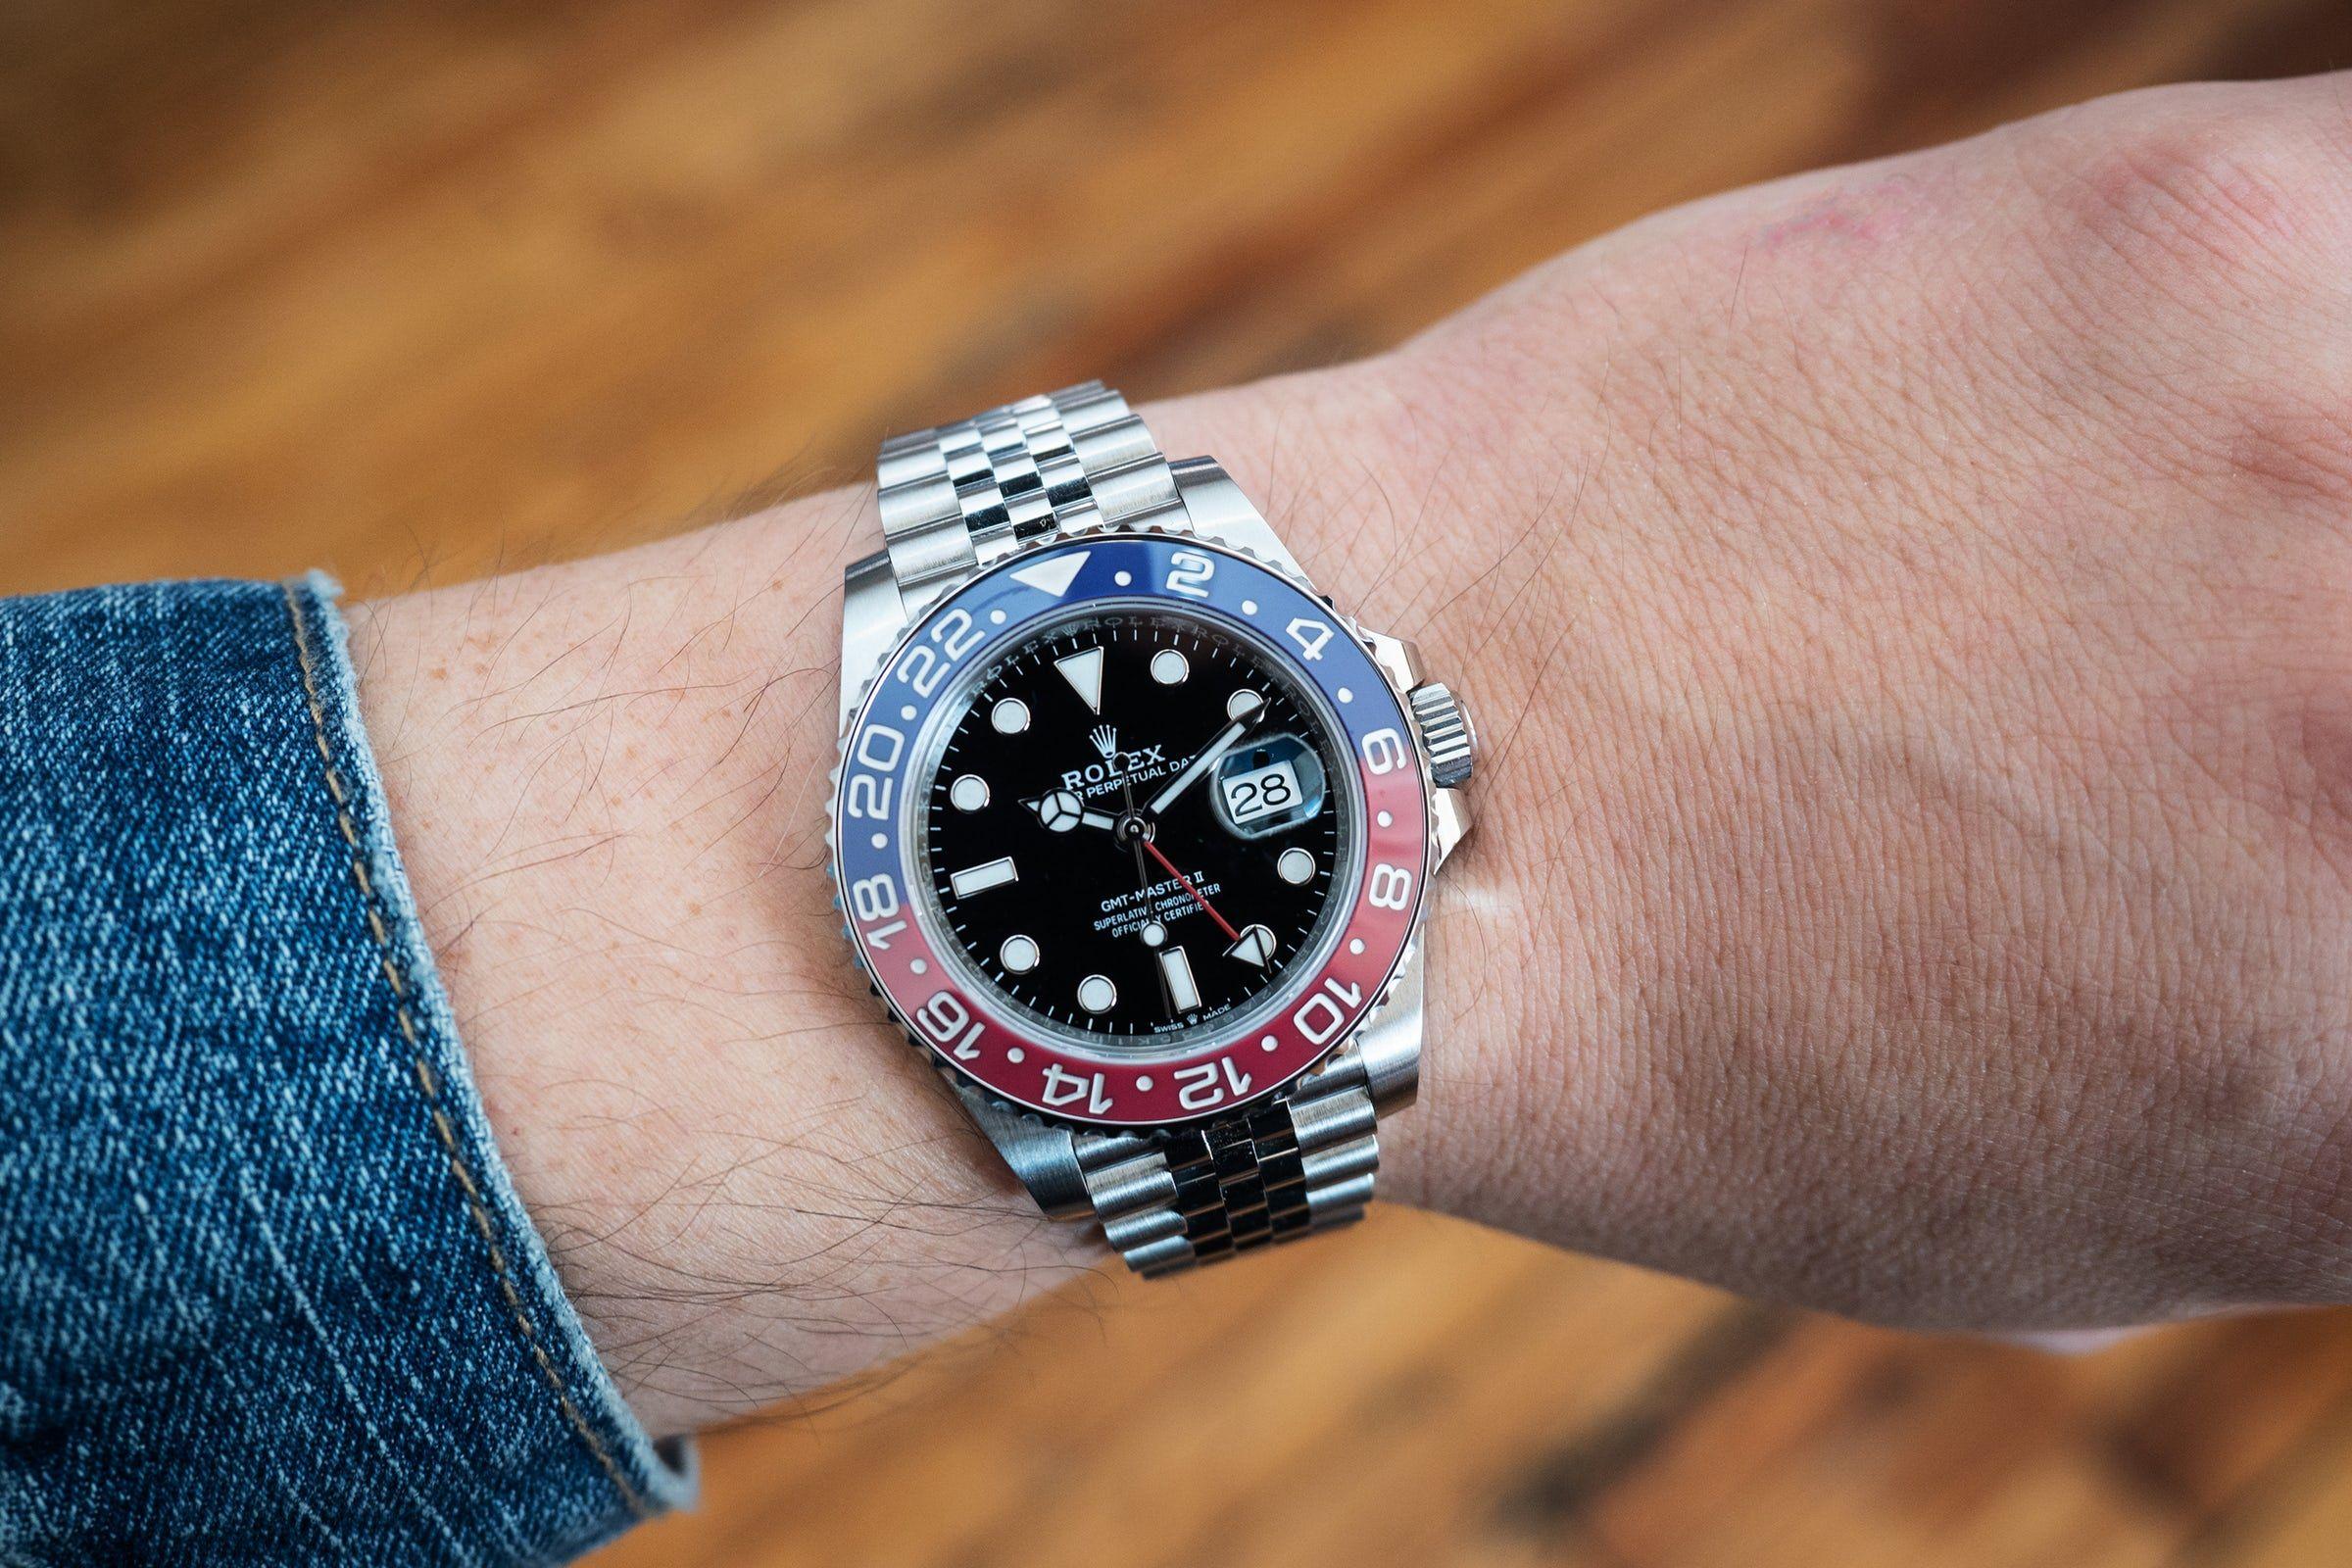 Hands On The Rolex Gmt Master Ii Ref 126710 Blro Pepsi Bezel With Jubilee Bracelet In Stainless Steel